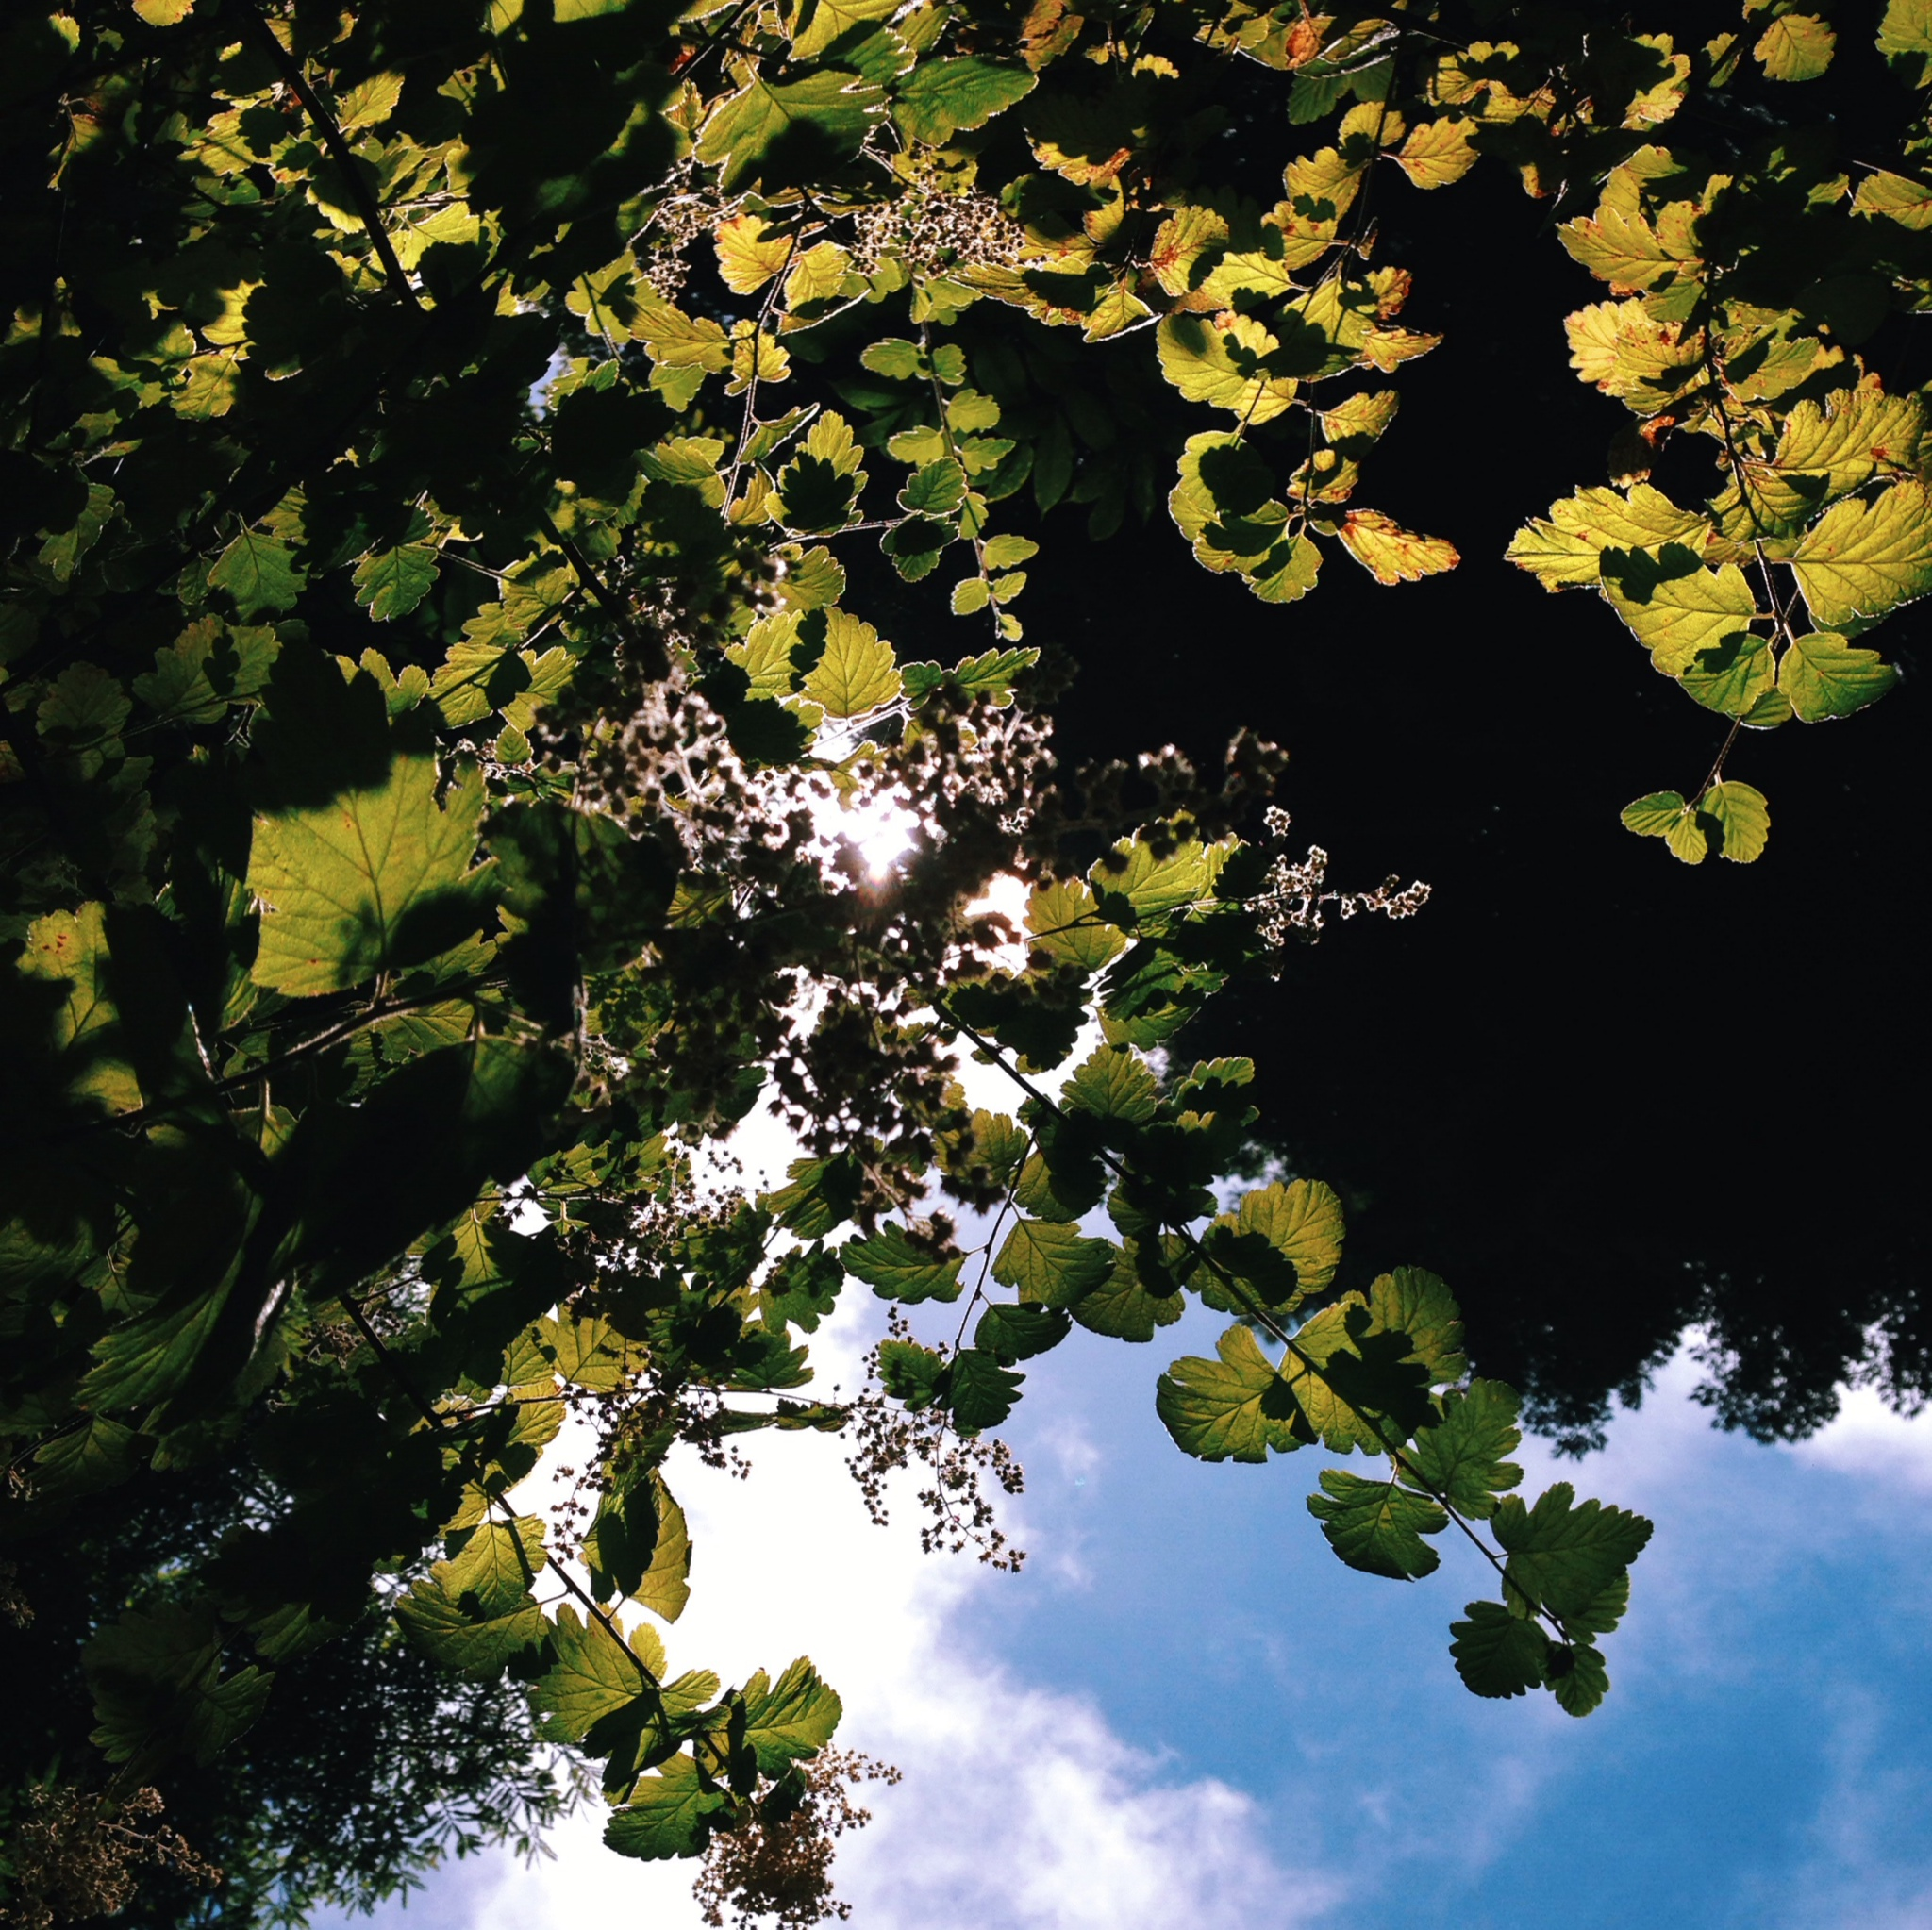 Sunlight through the trees in the Botanic Gardens